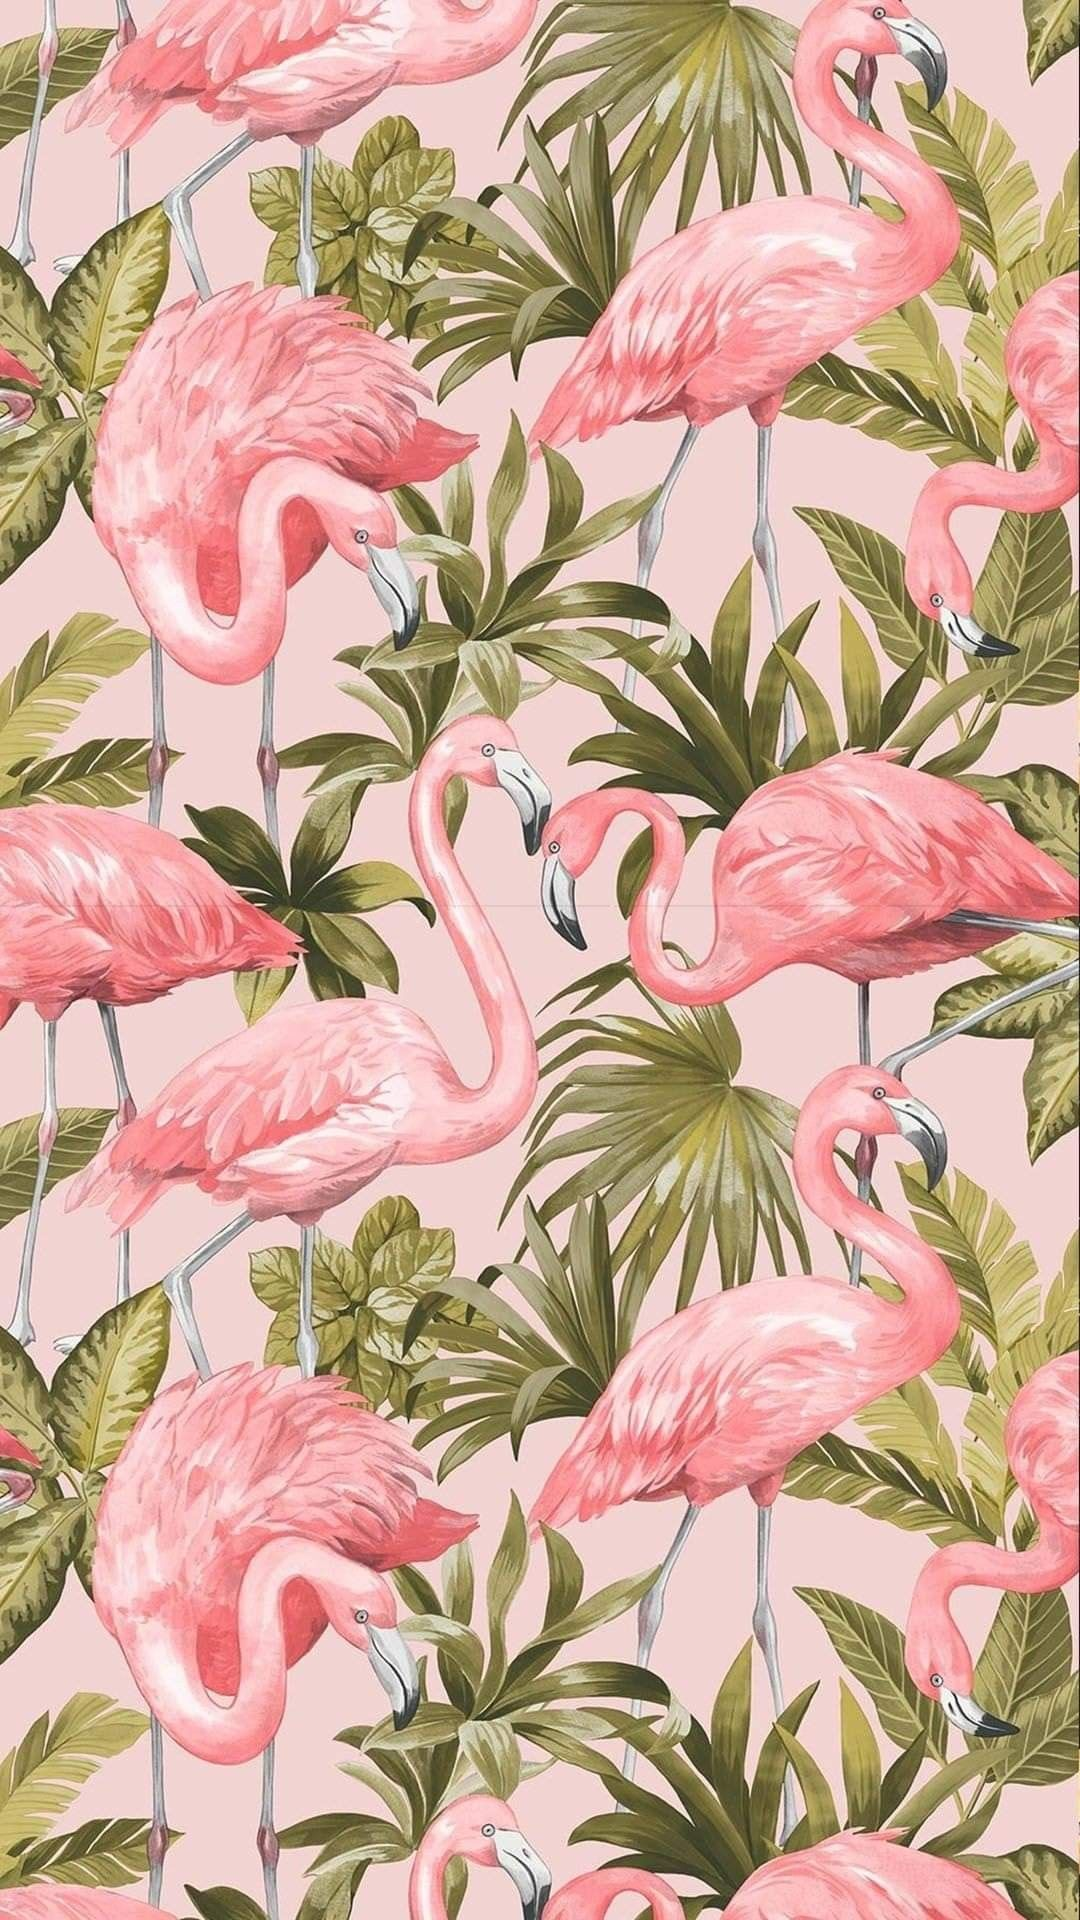 Pink Flamingo Walpaper Flamingo Wallpaper Pink Flamingo